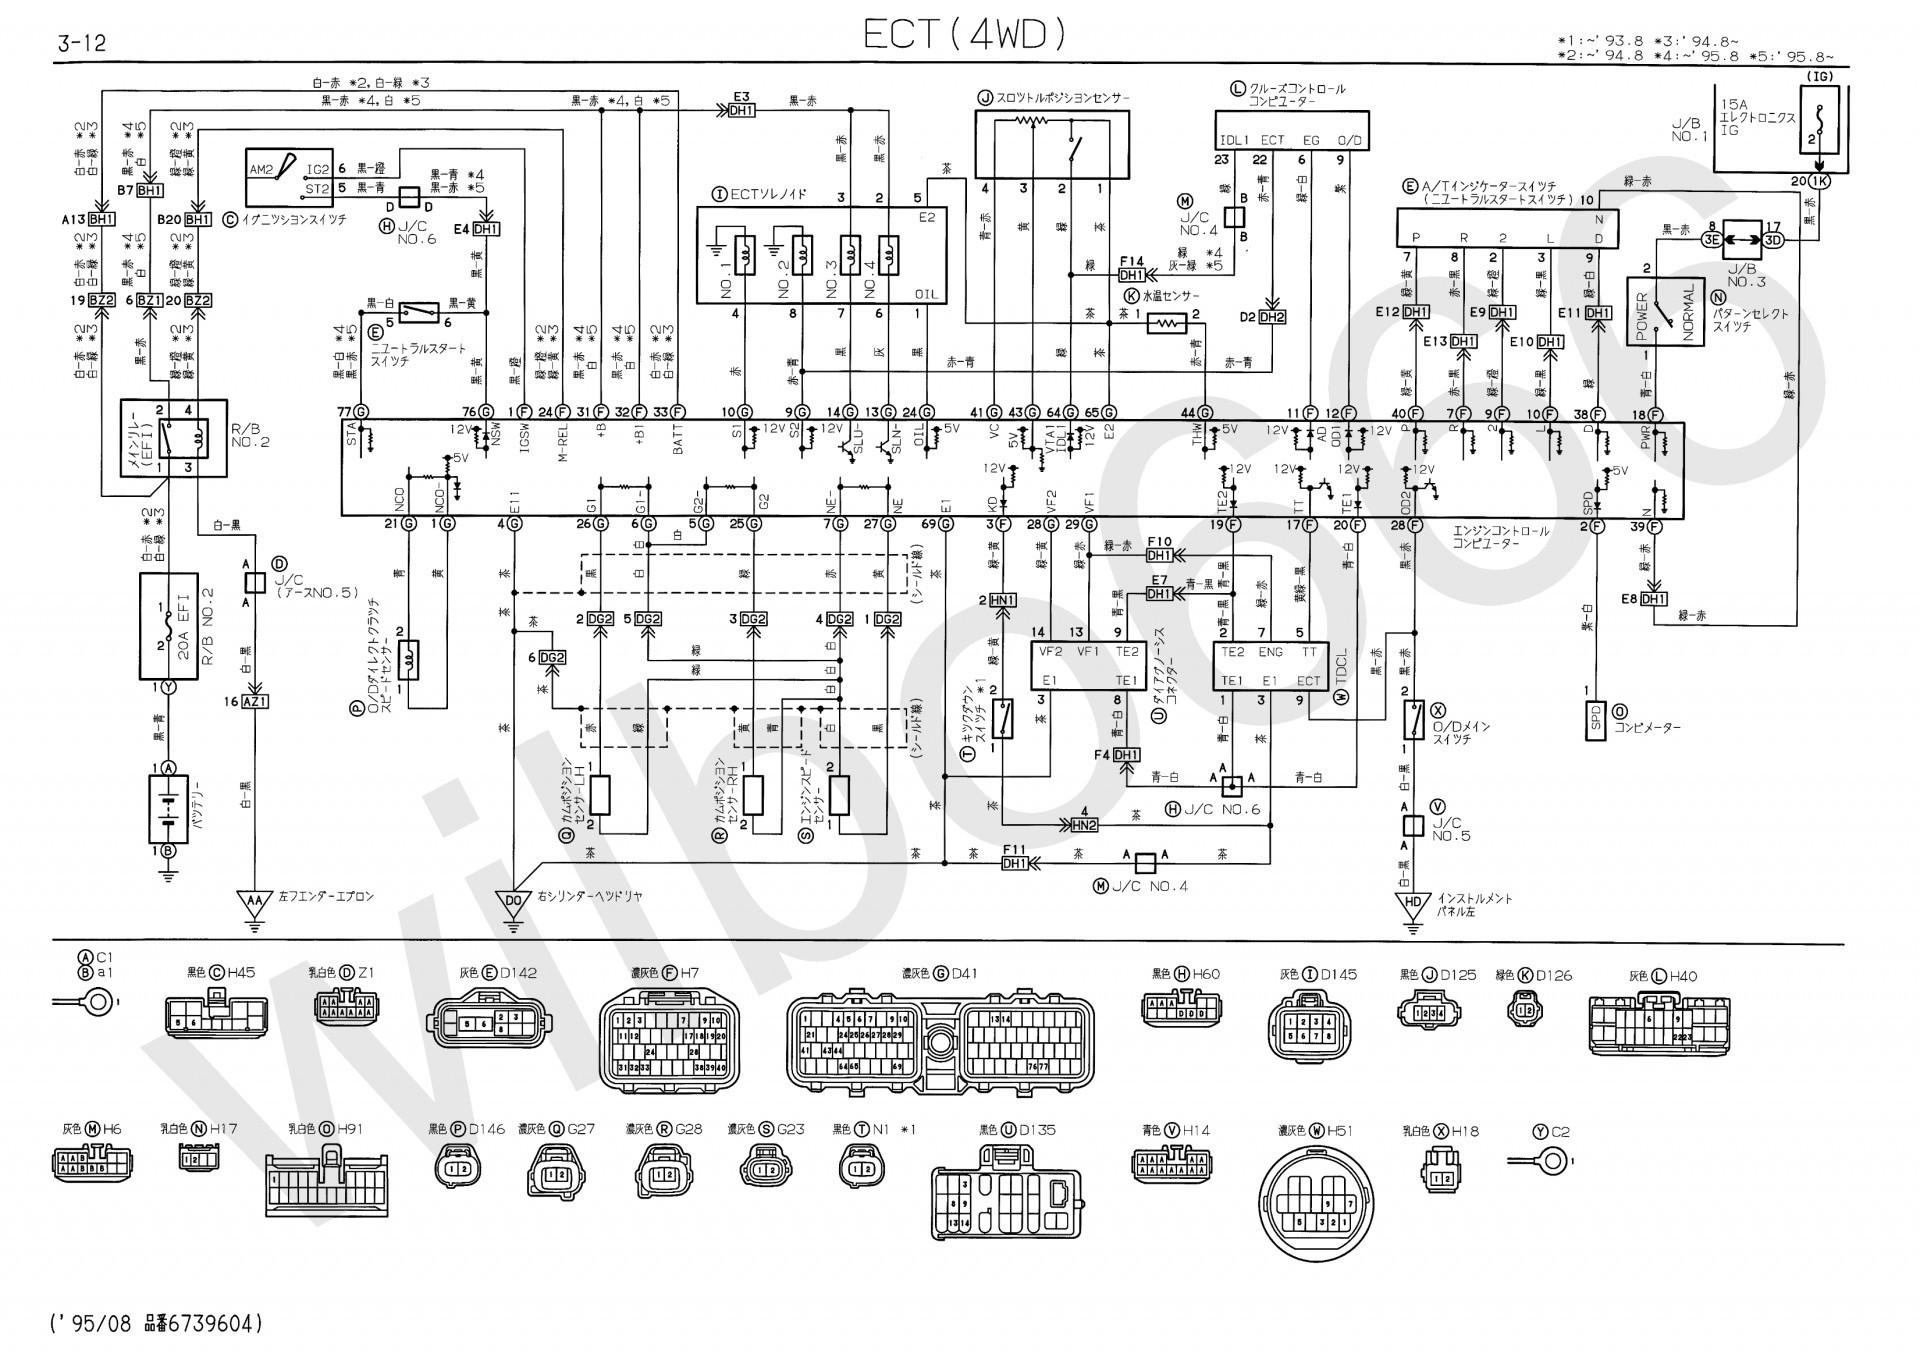 hight resolution of engine wiring diagram diagram electricity unique diagram engine electrical floor plan of engine wiring diagram 1993 engine wiring diagram 1993 bmw 525i